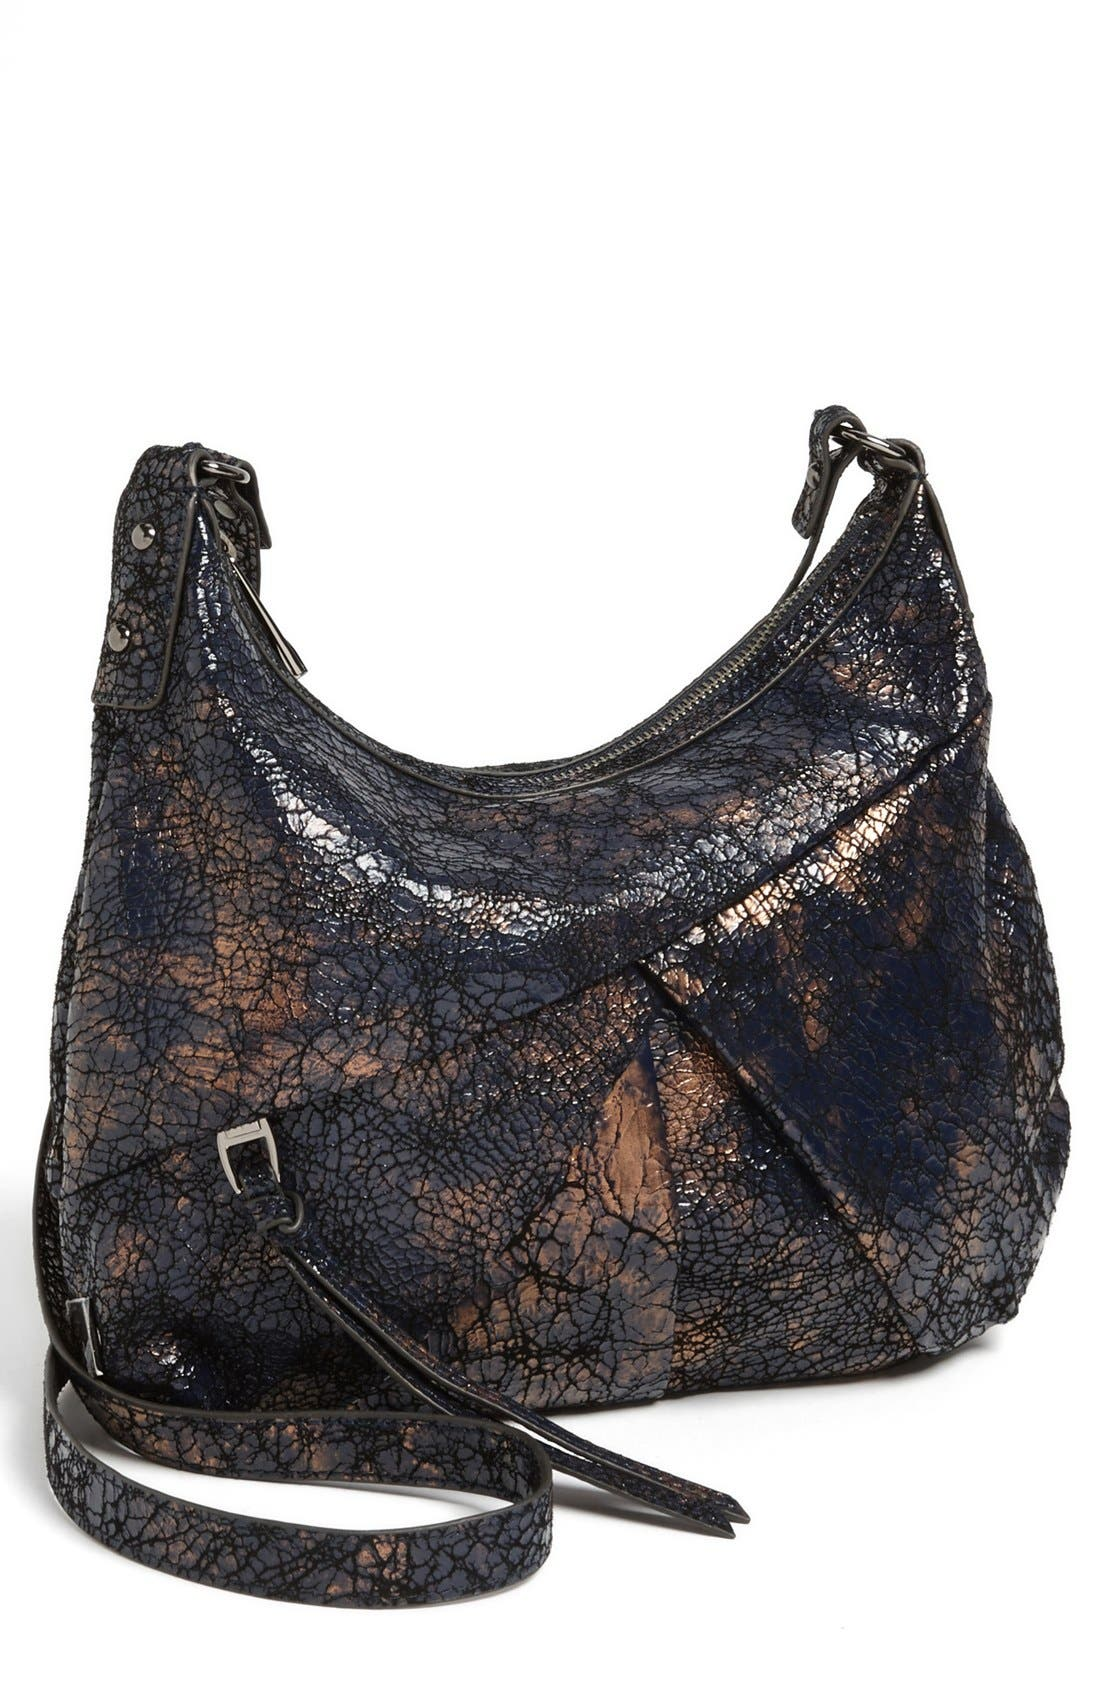 Alternate Image 1 Selected - Kooba 'Tia' Leather Crossbody Bag